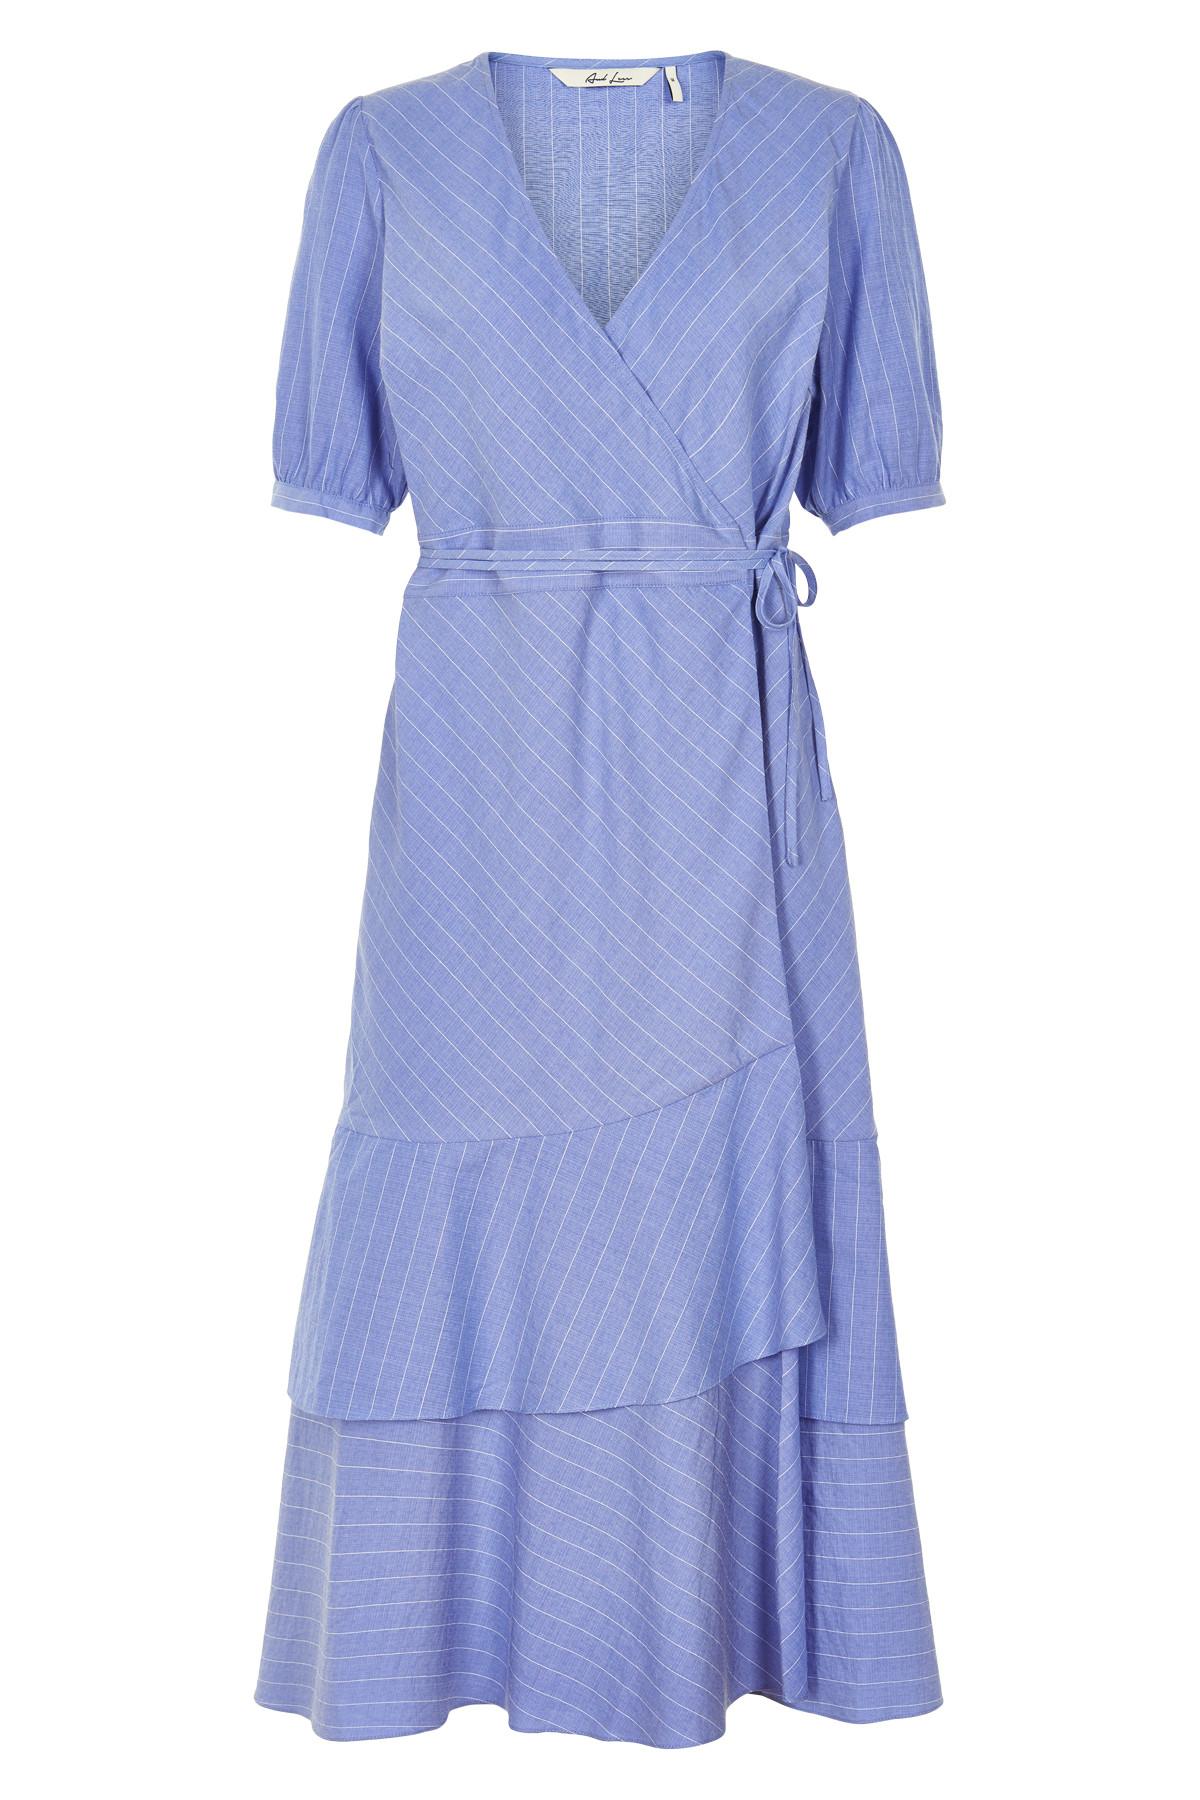 Image of   AND LESS PIOLAA KJOLE 5219803 (Blue Stripe, 38)